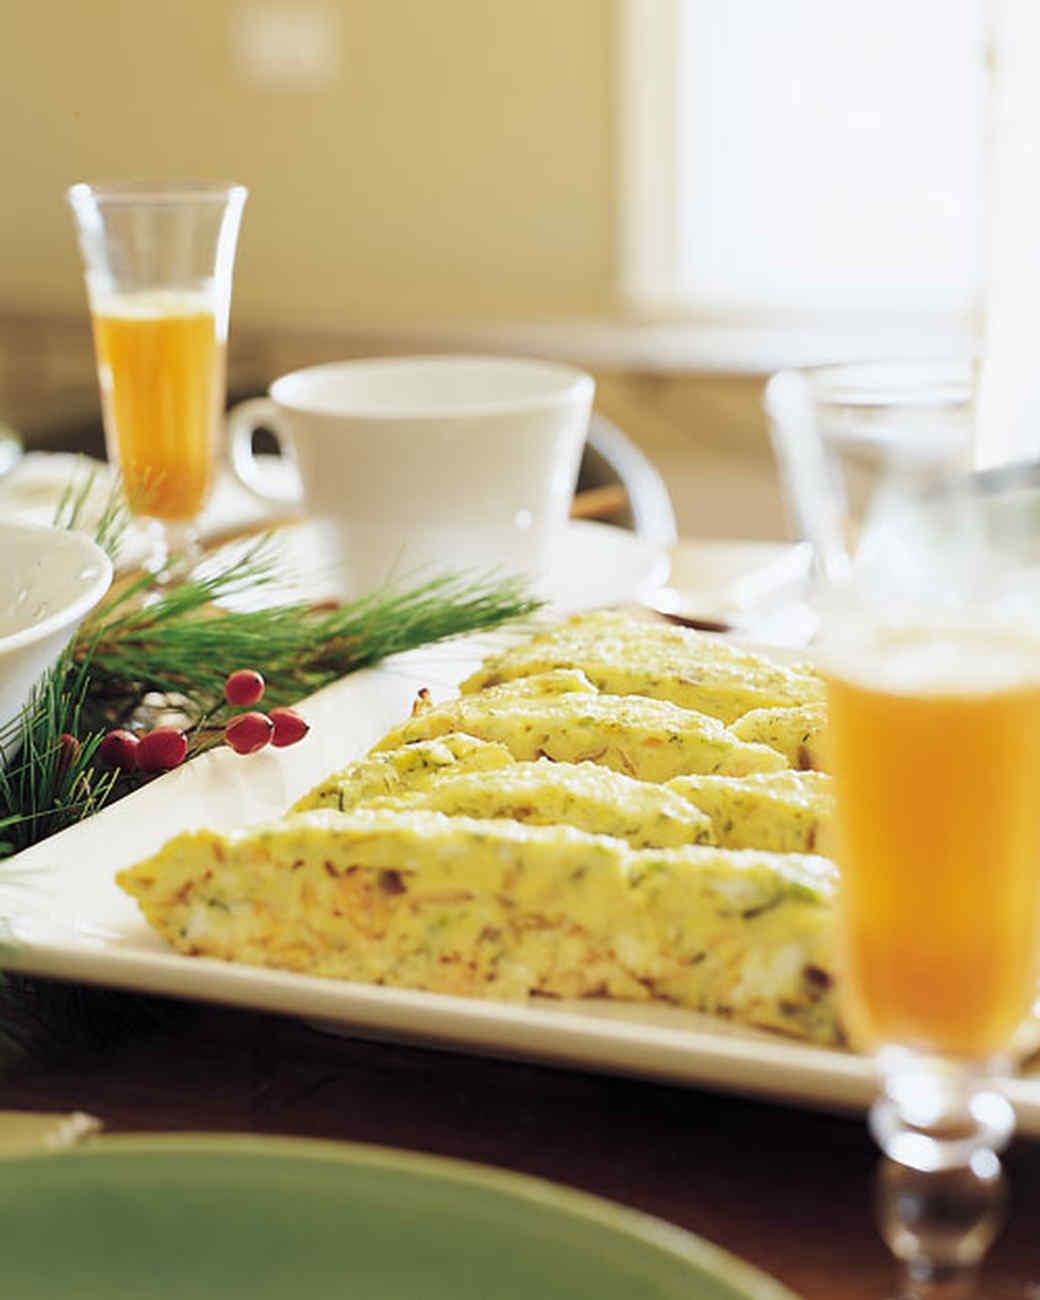 frittata and strata recipes martha stewart - Strata Recipes For Brunch